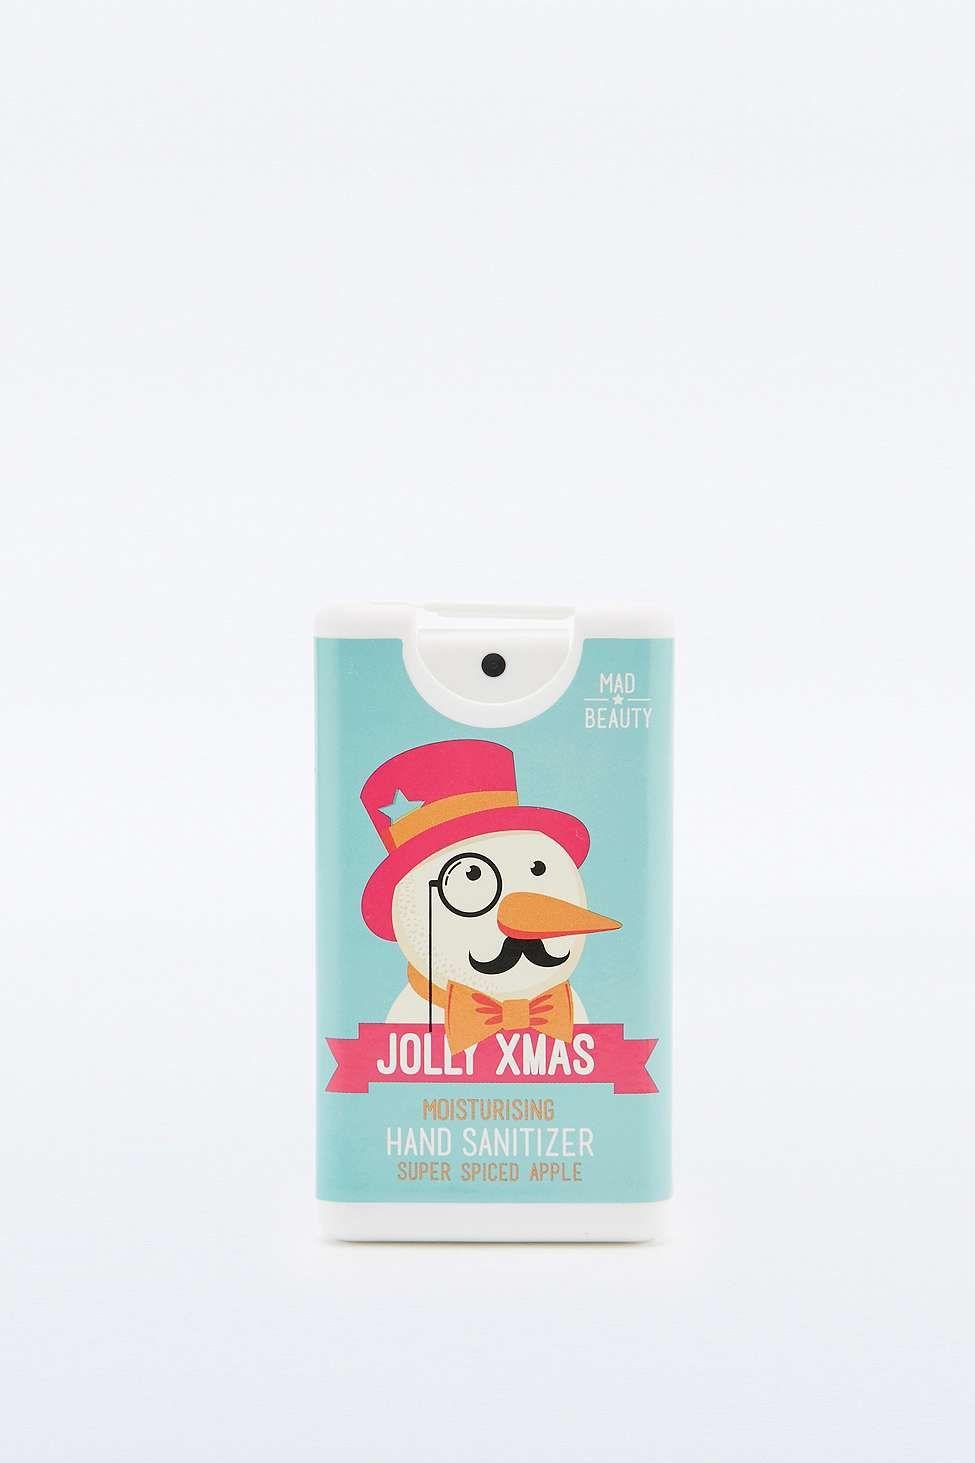 Mad Beauty Jolly X Mas Spiced Apple Moisturising Hand Sanitizer